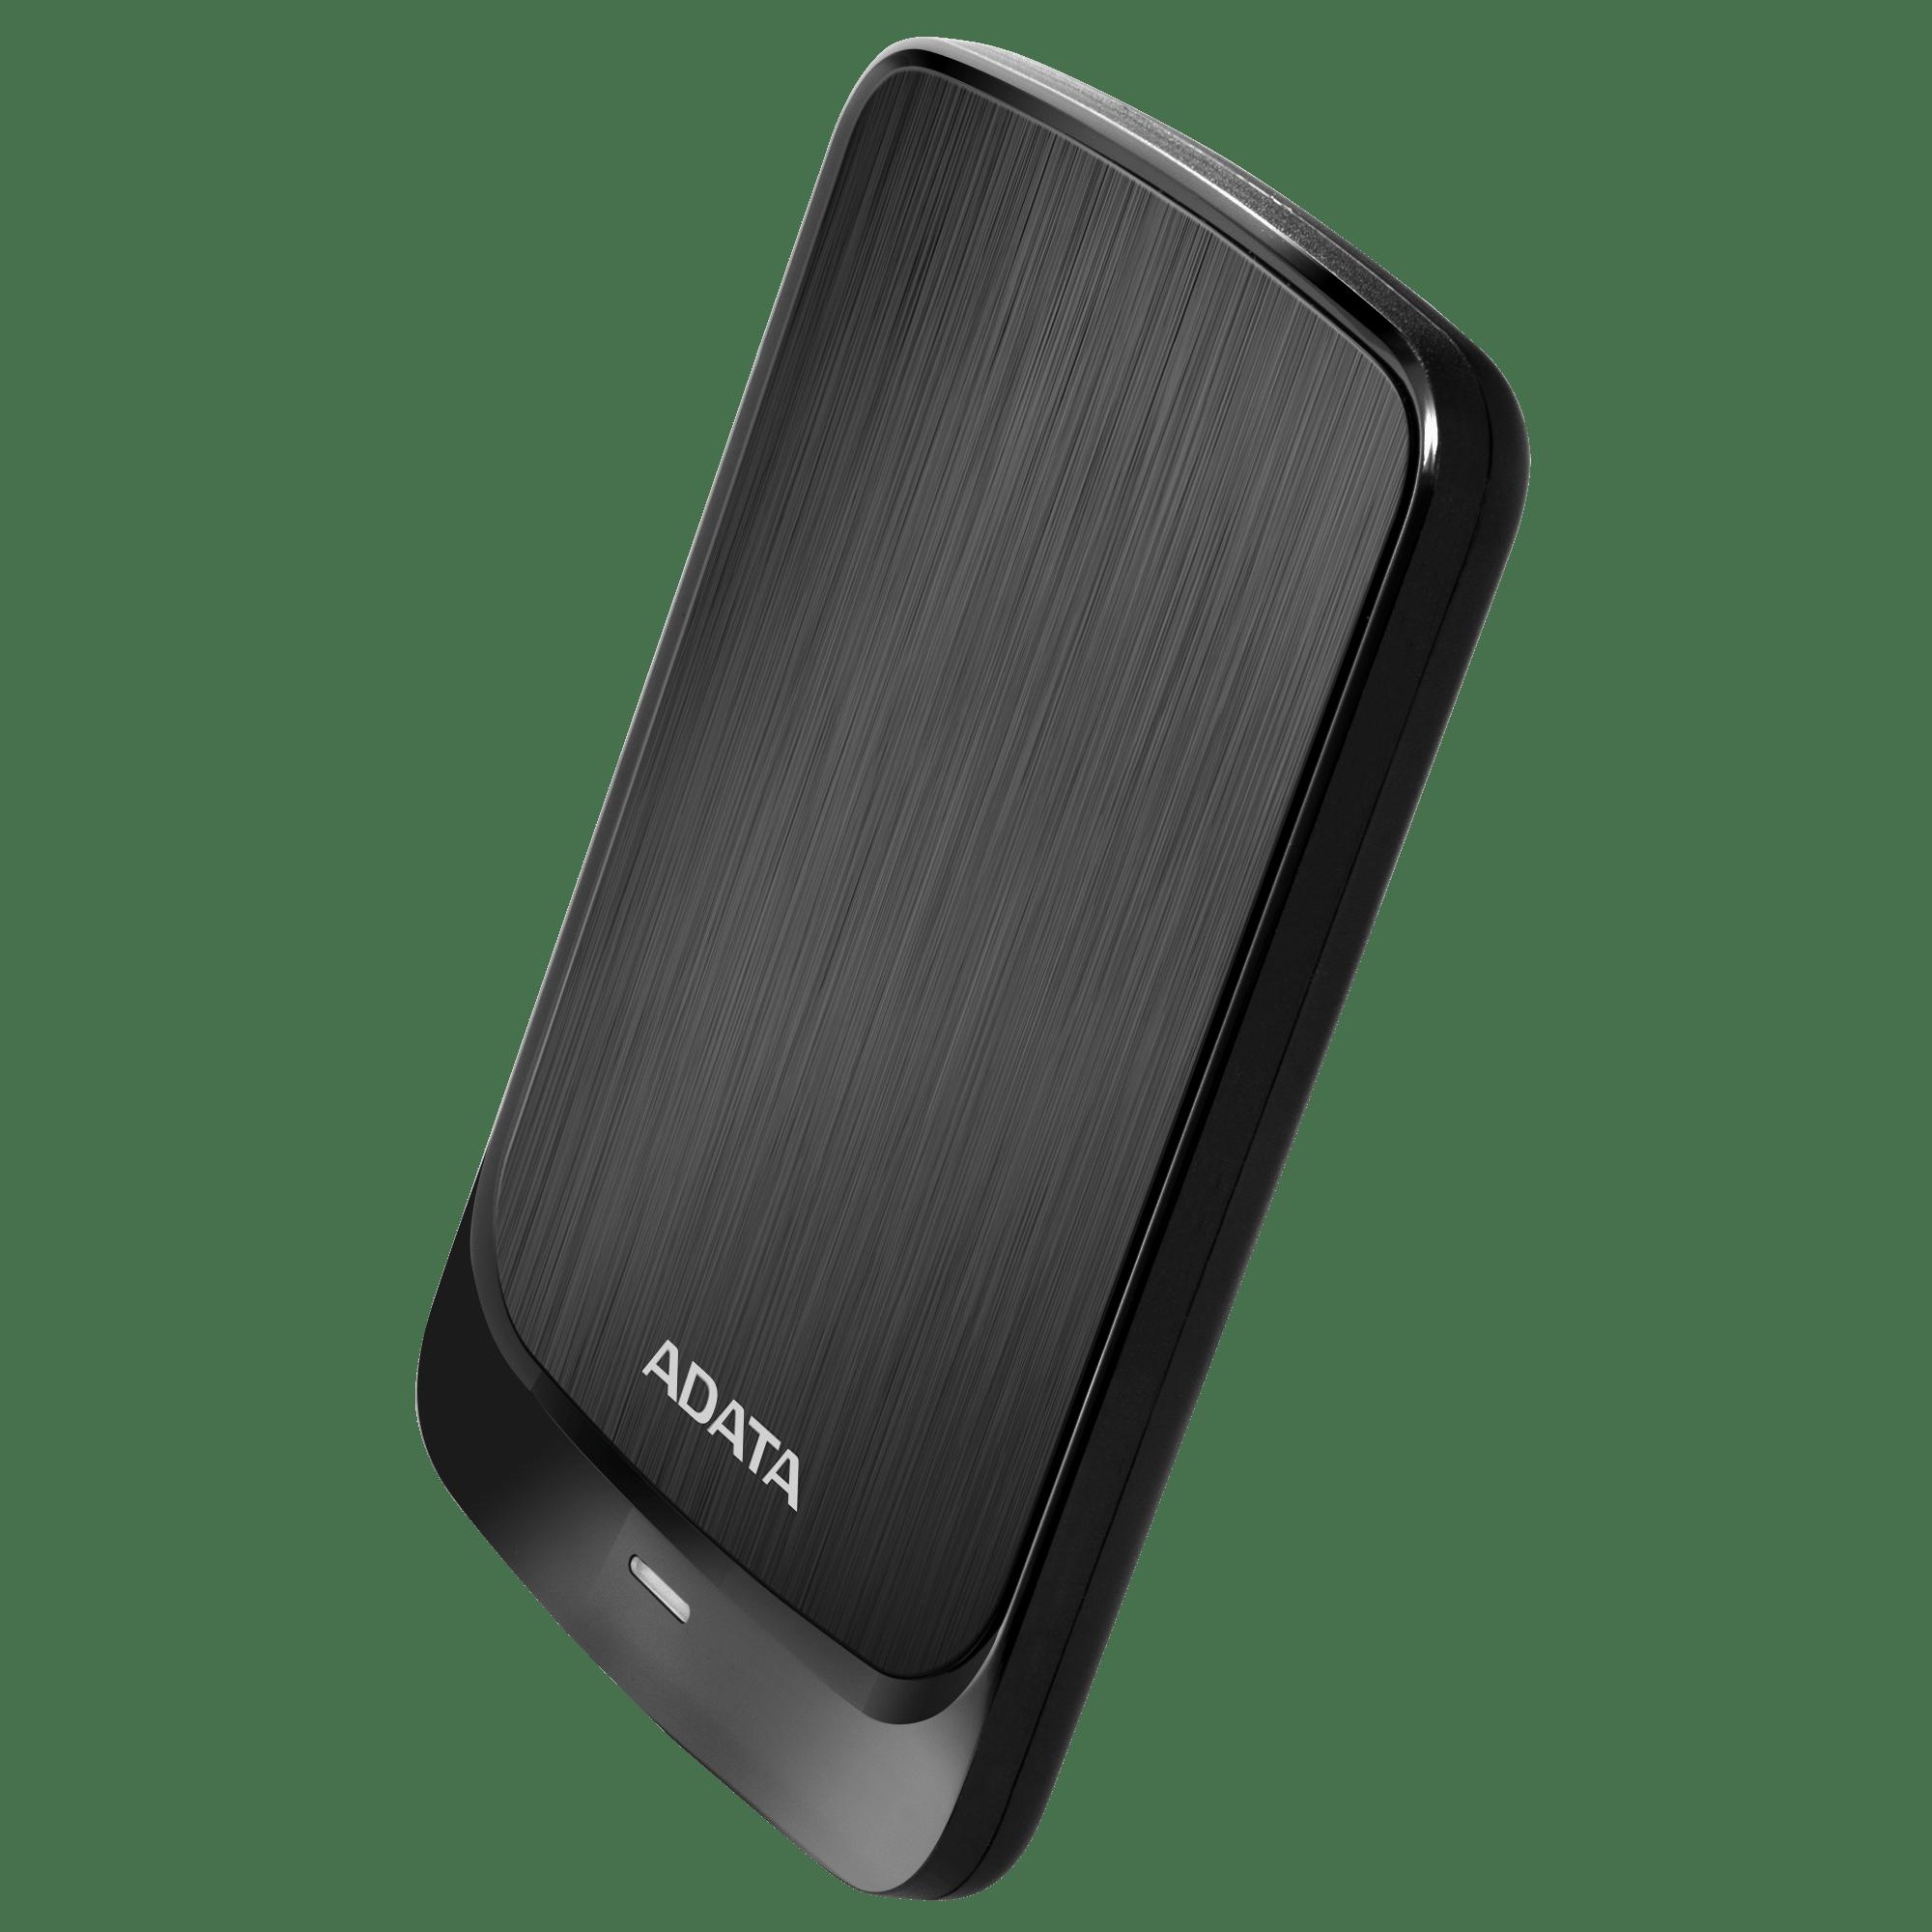 Disco Duro Externo 4Tb Adata USB 3.1 HV320 Black